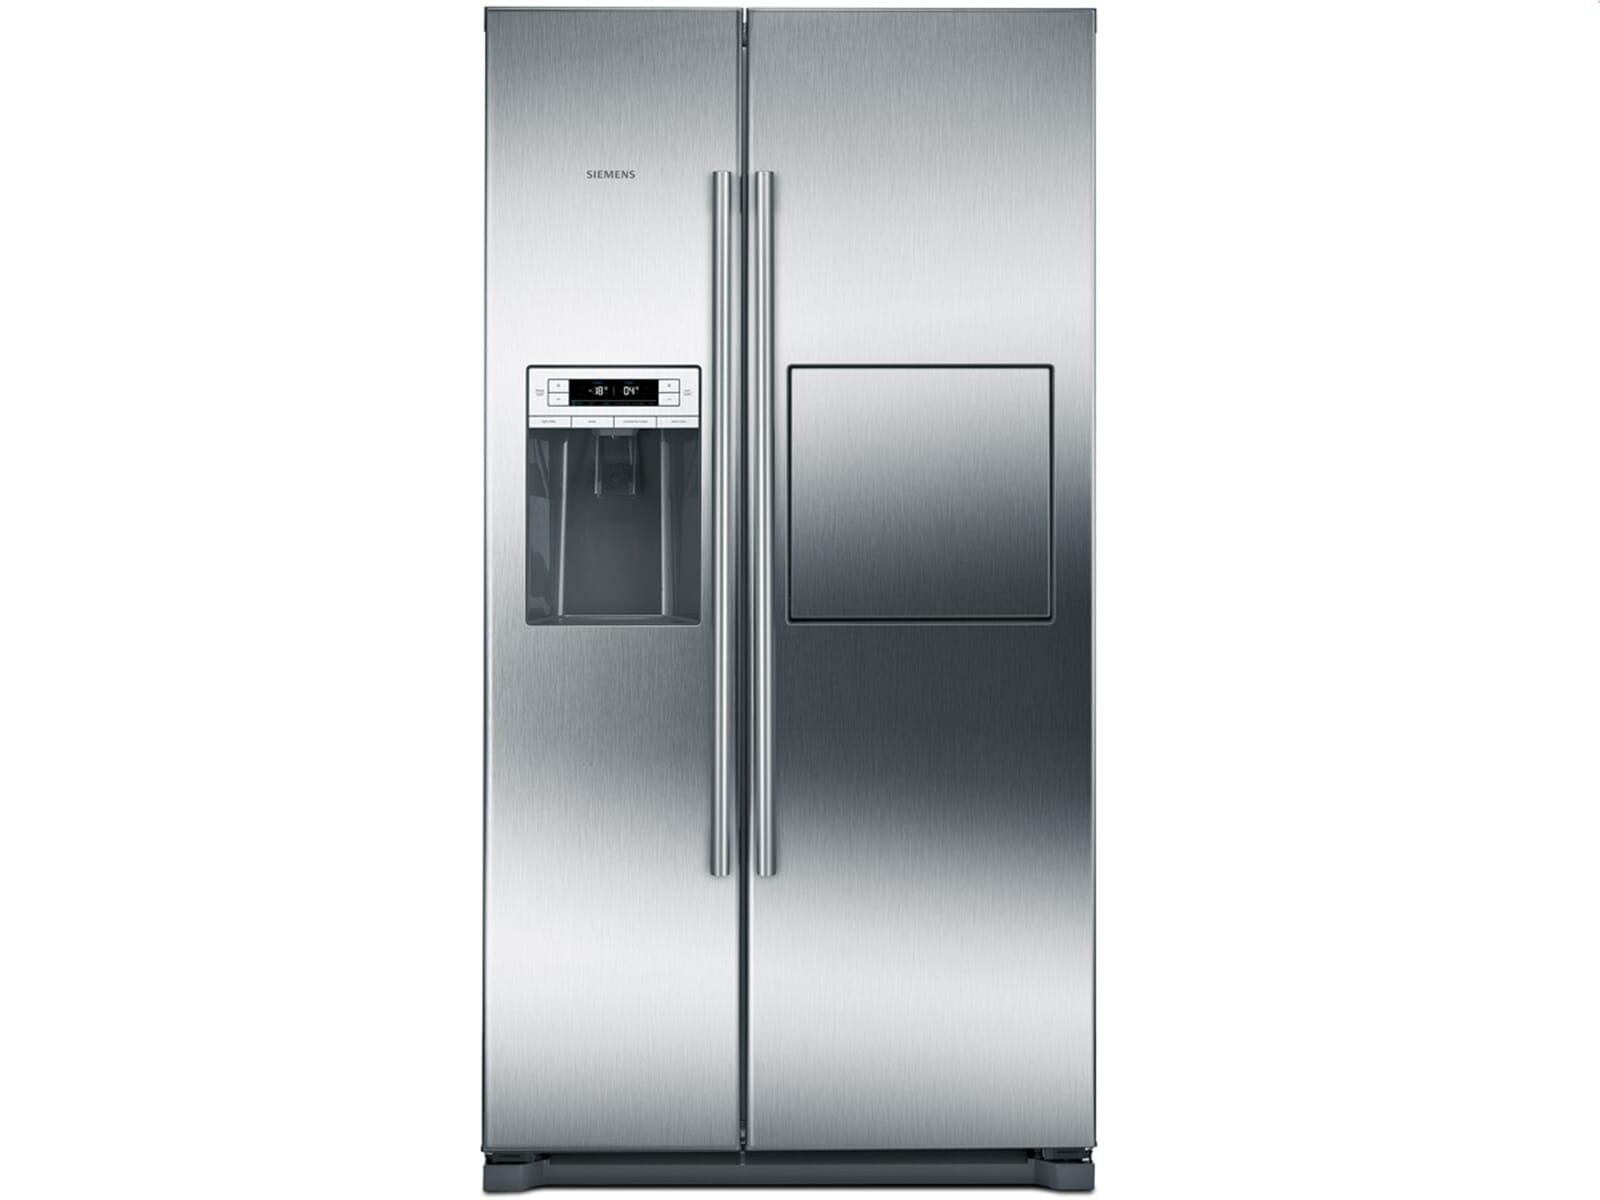 Siemens Kühlschrank Wasserfilter : Siemens ka gai side by side kühl gefrier kombination edelstahl